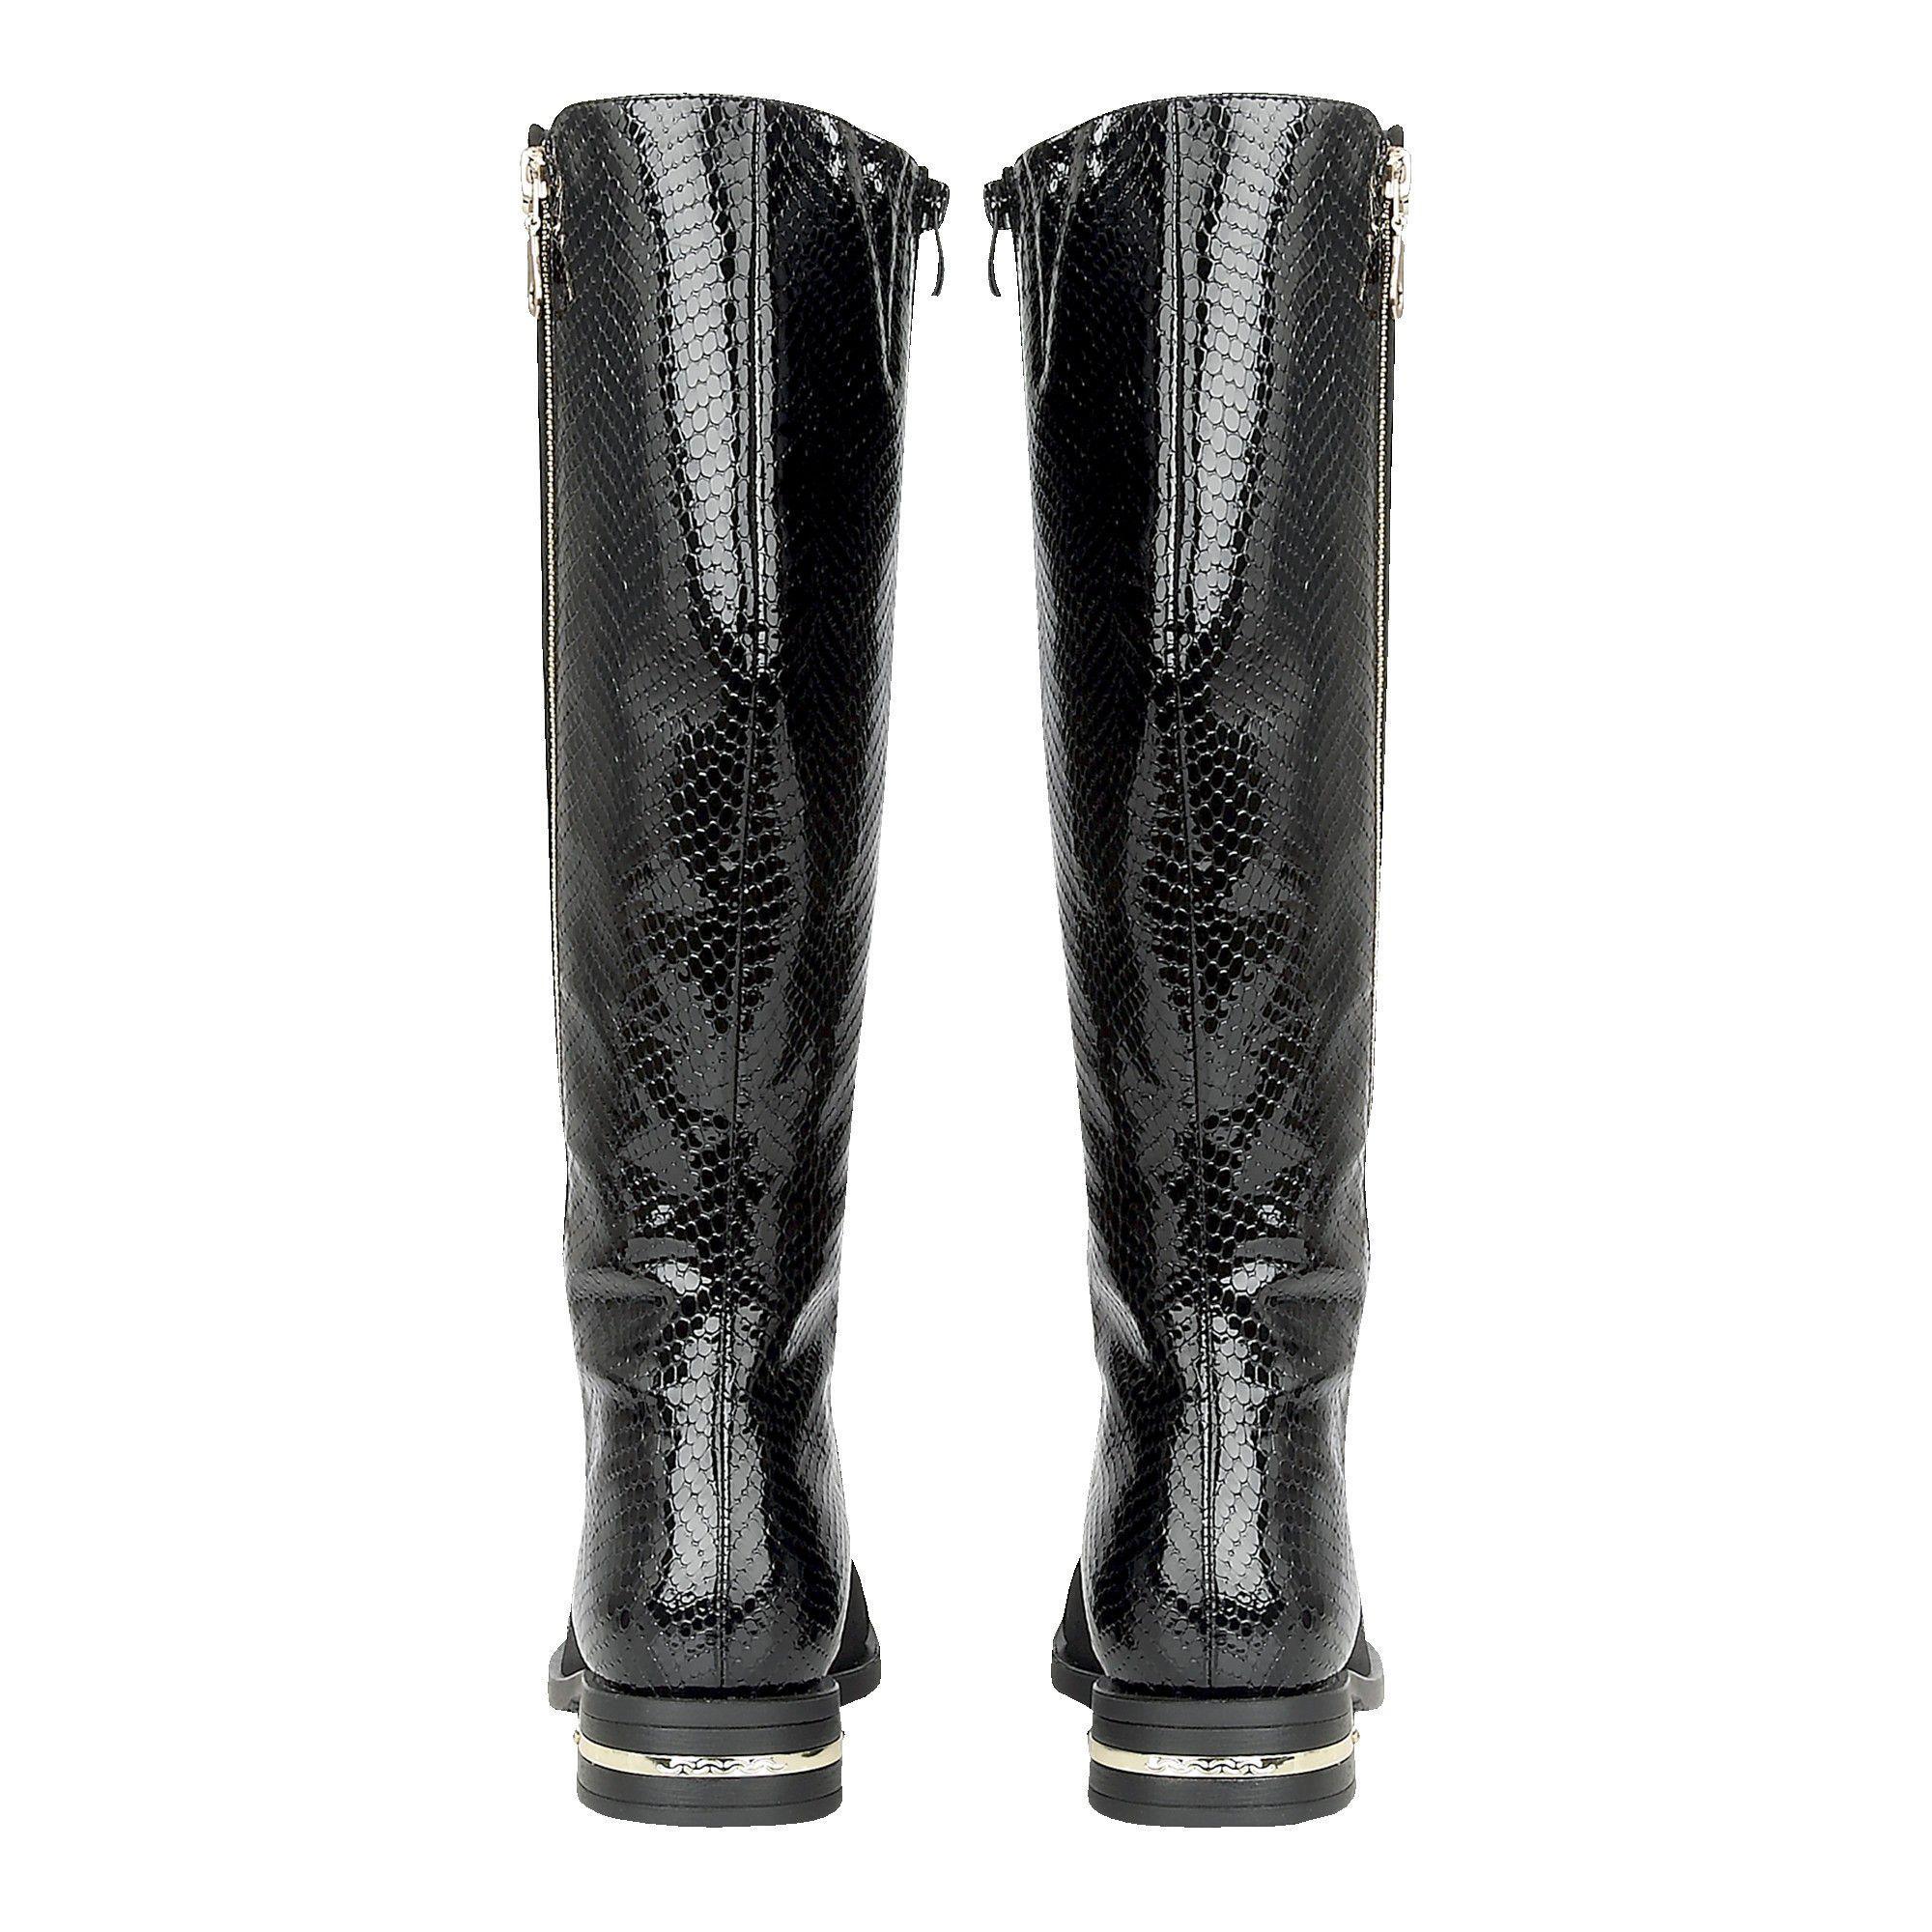 40d6f5ac4ad4 Lotus Black  pontal  Block Heel Knee High Boots in Black - Lyst